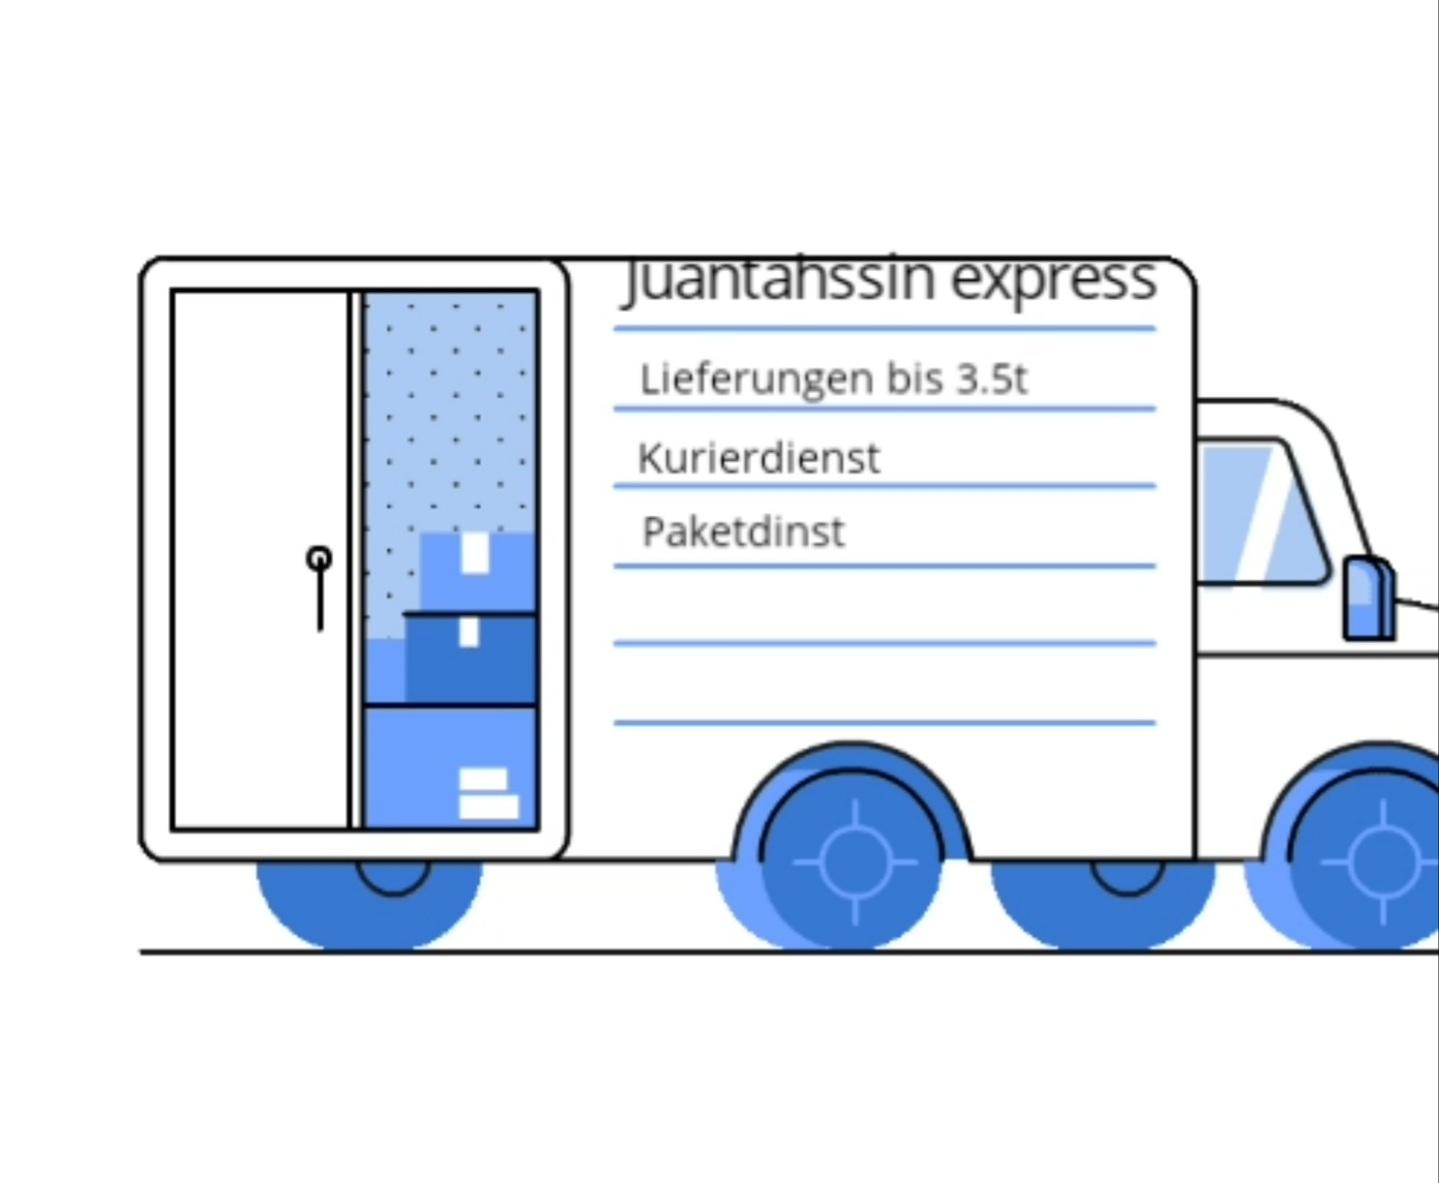 Juantahssin express